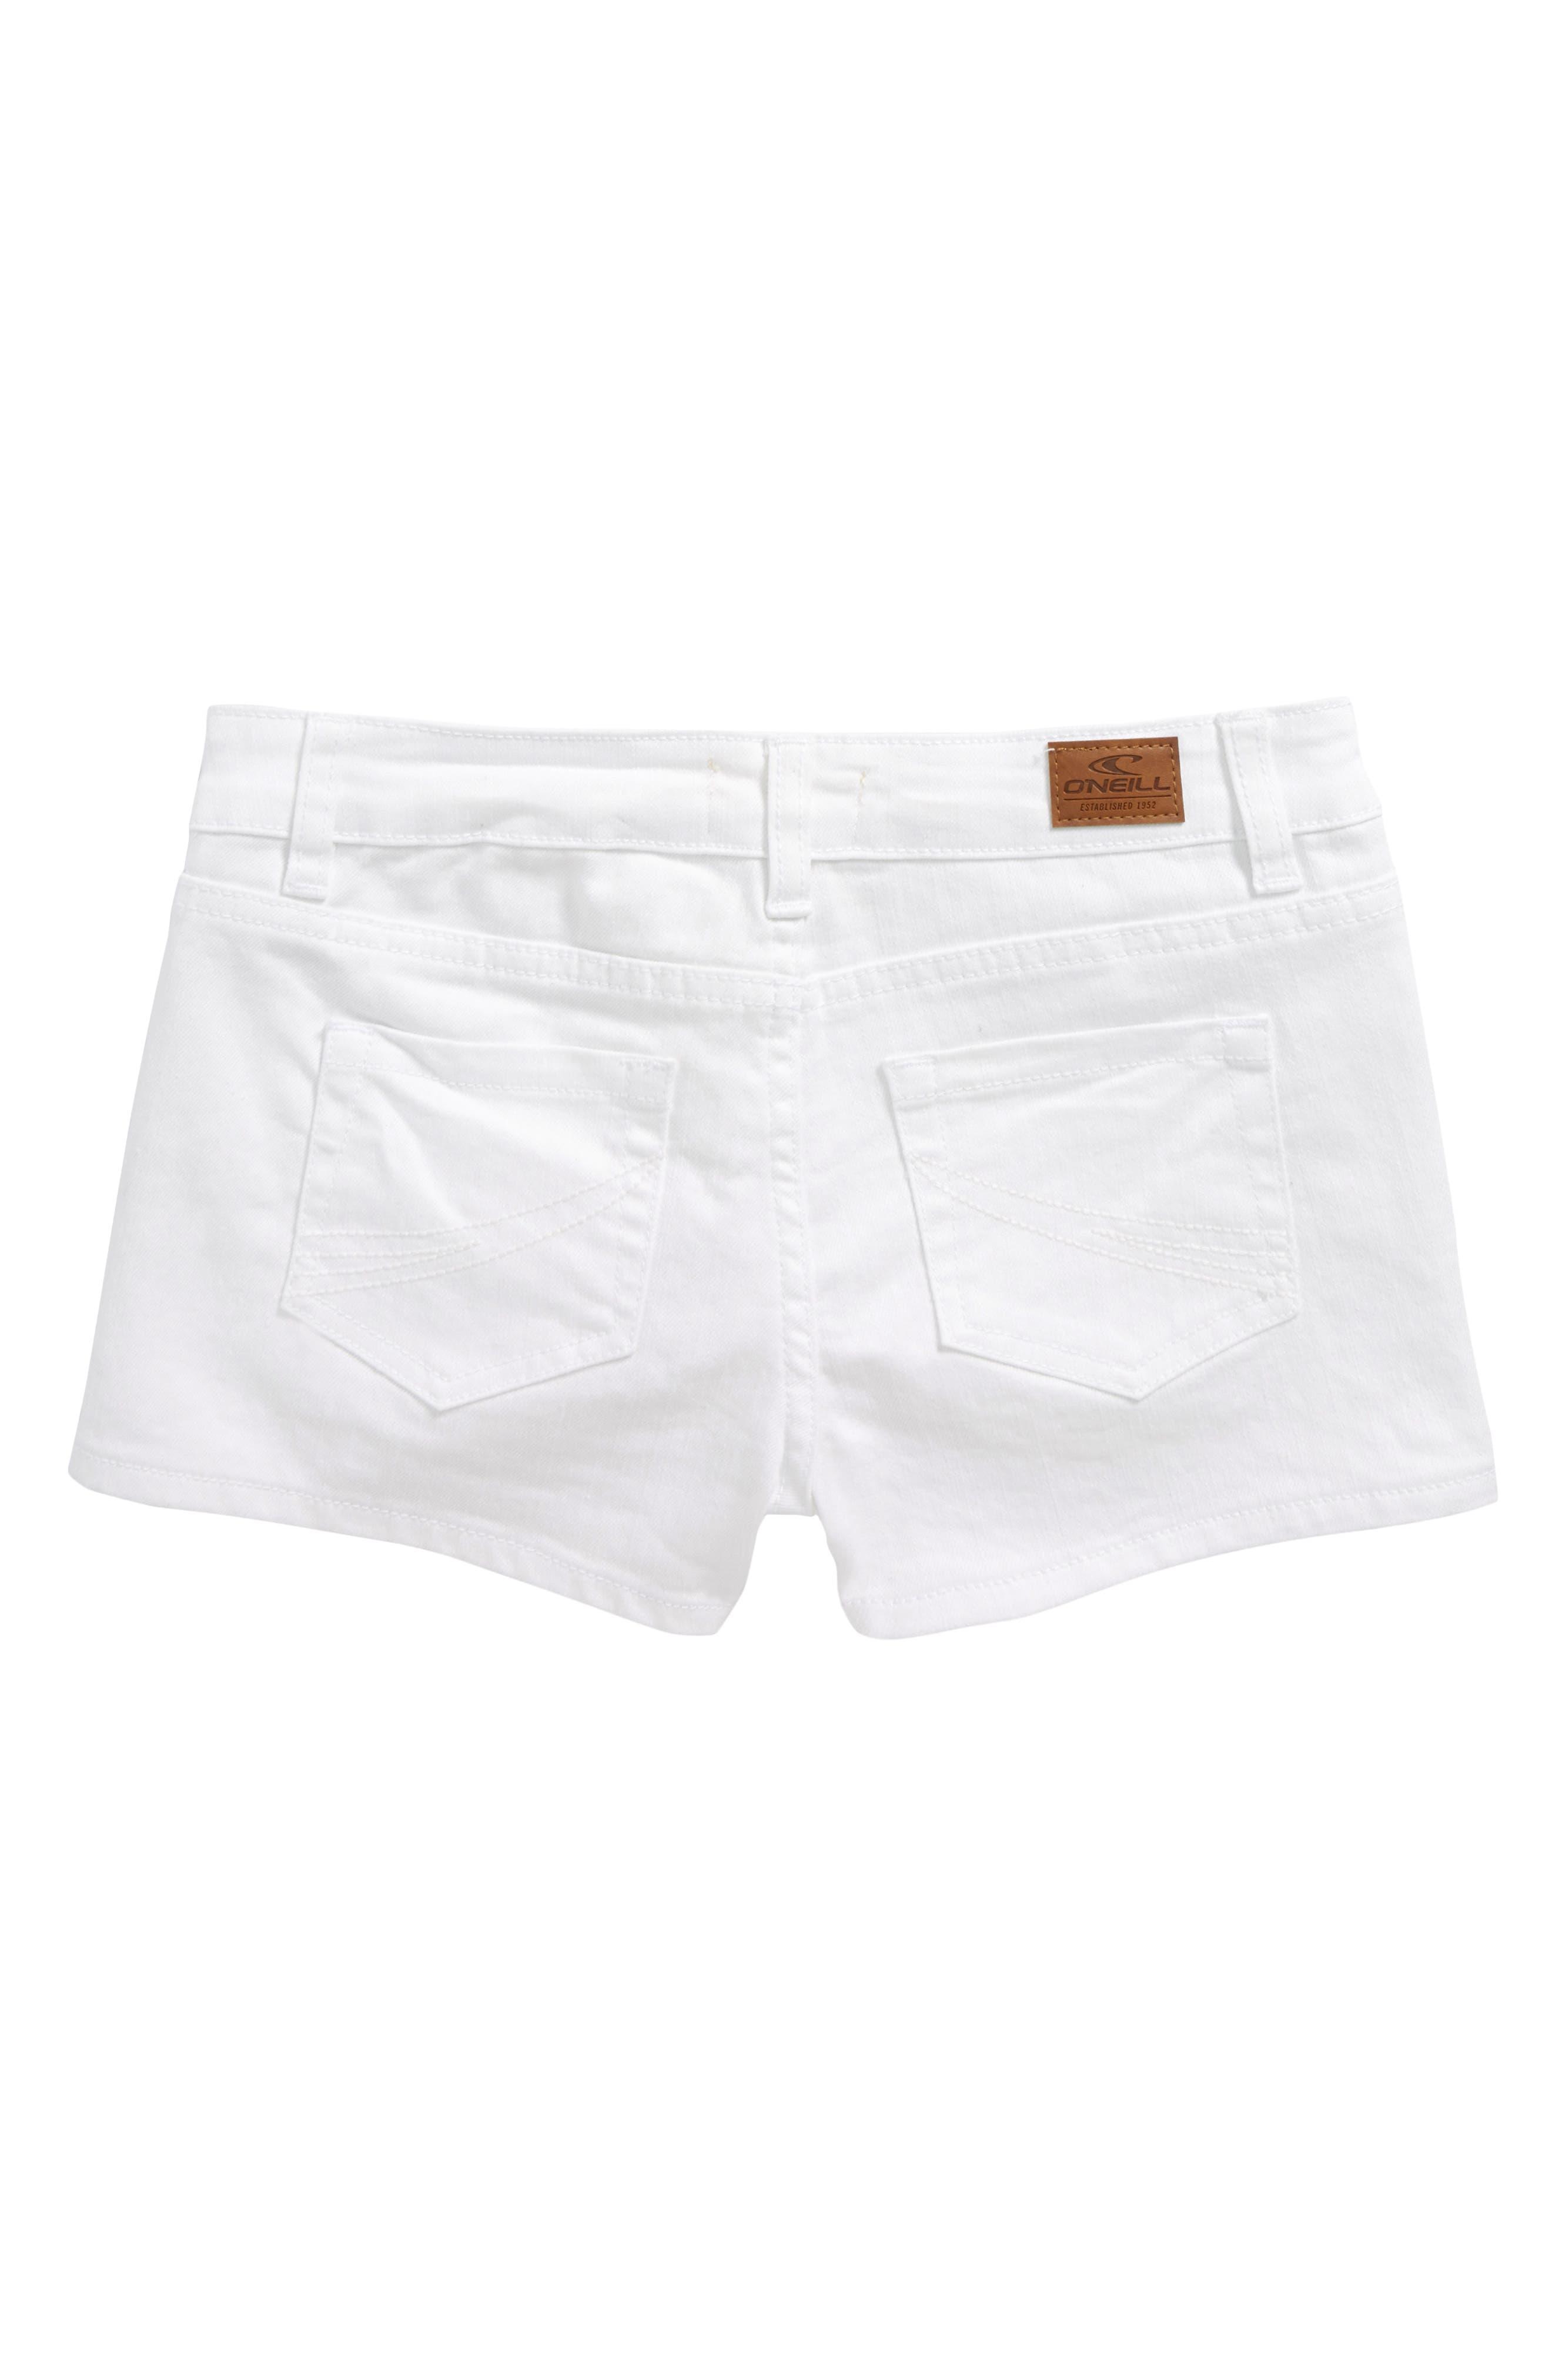 Waidley Denim Shorts,                             Alternate thumbnail 4, color,                             100